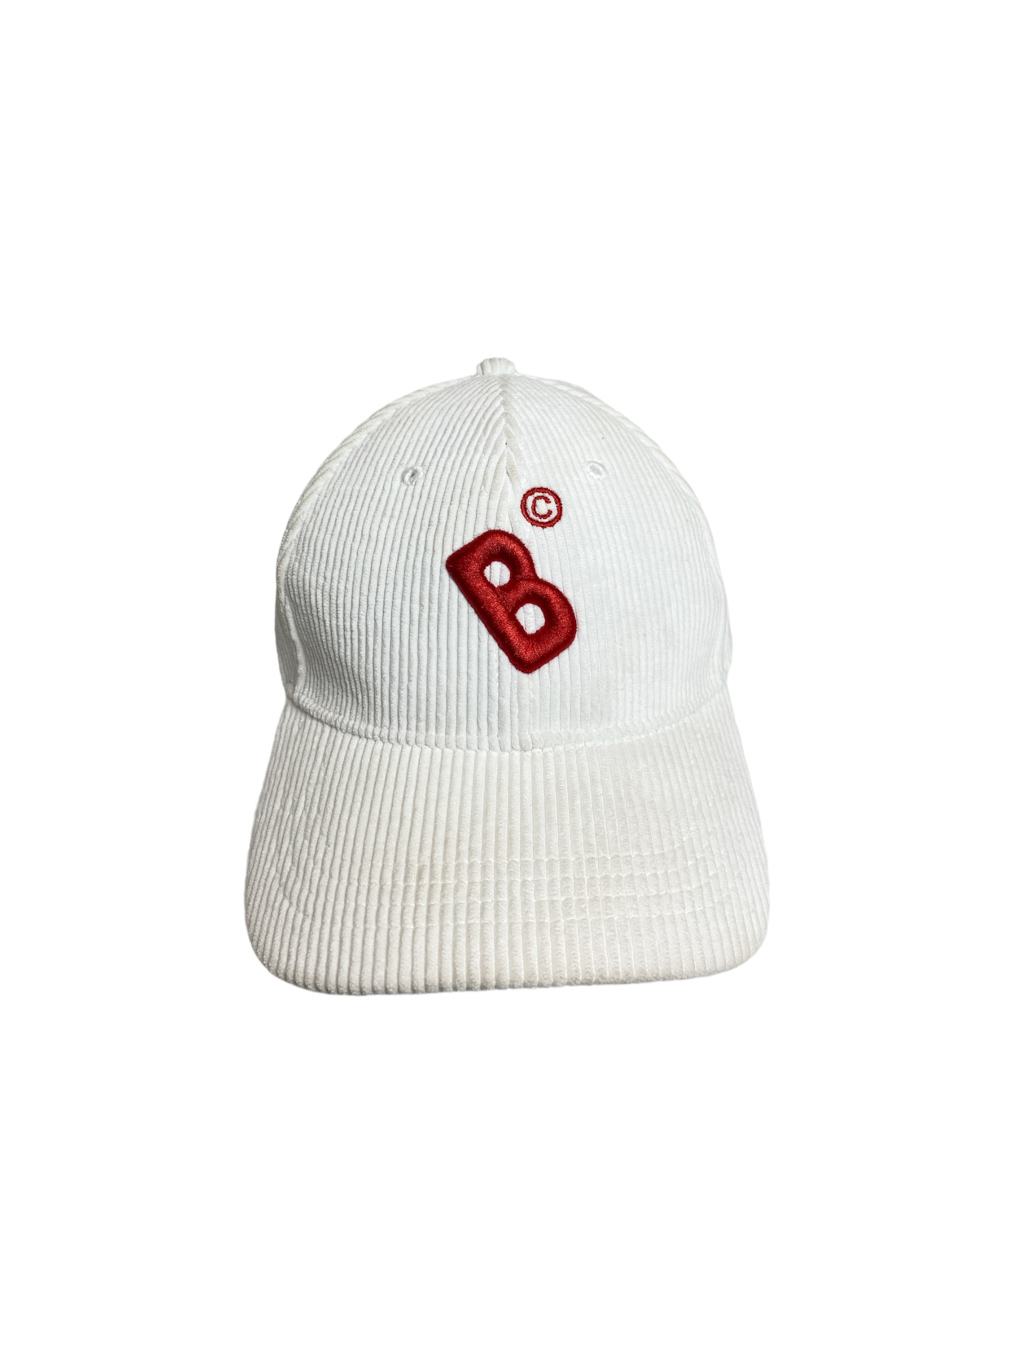 Bangkokr Cap ( White Corduroy )